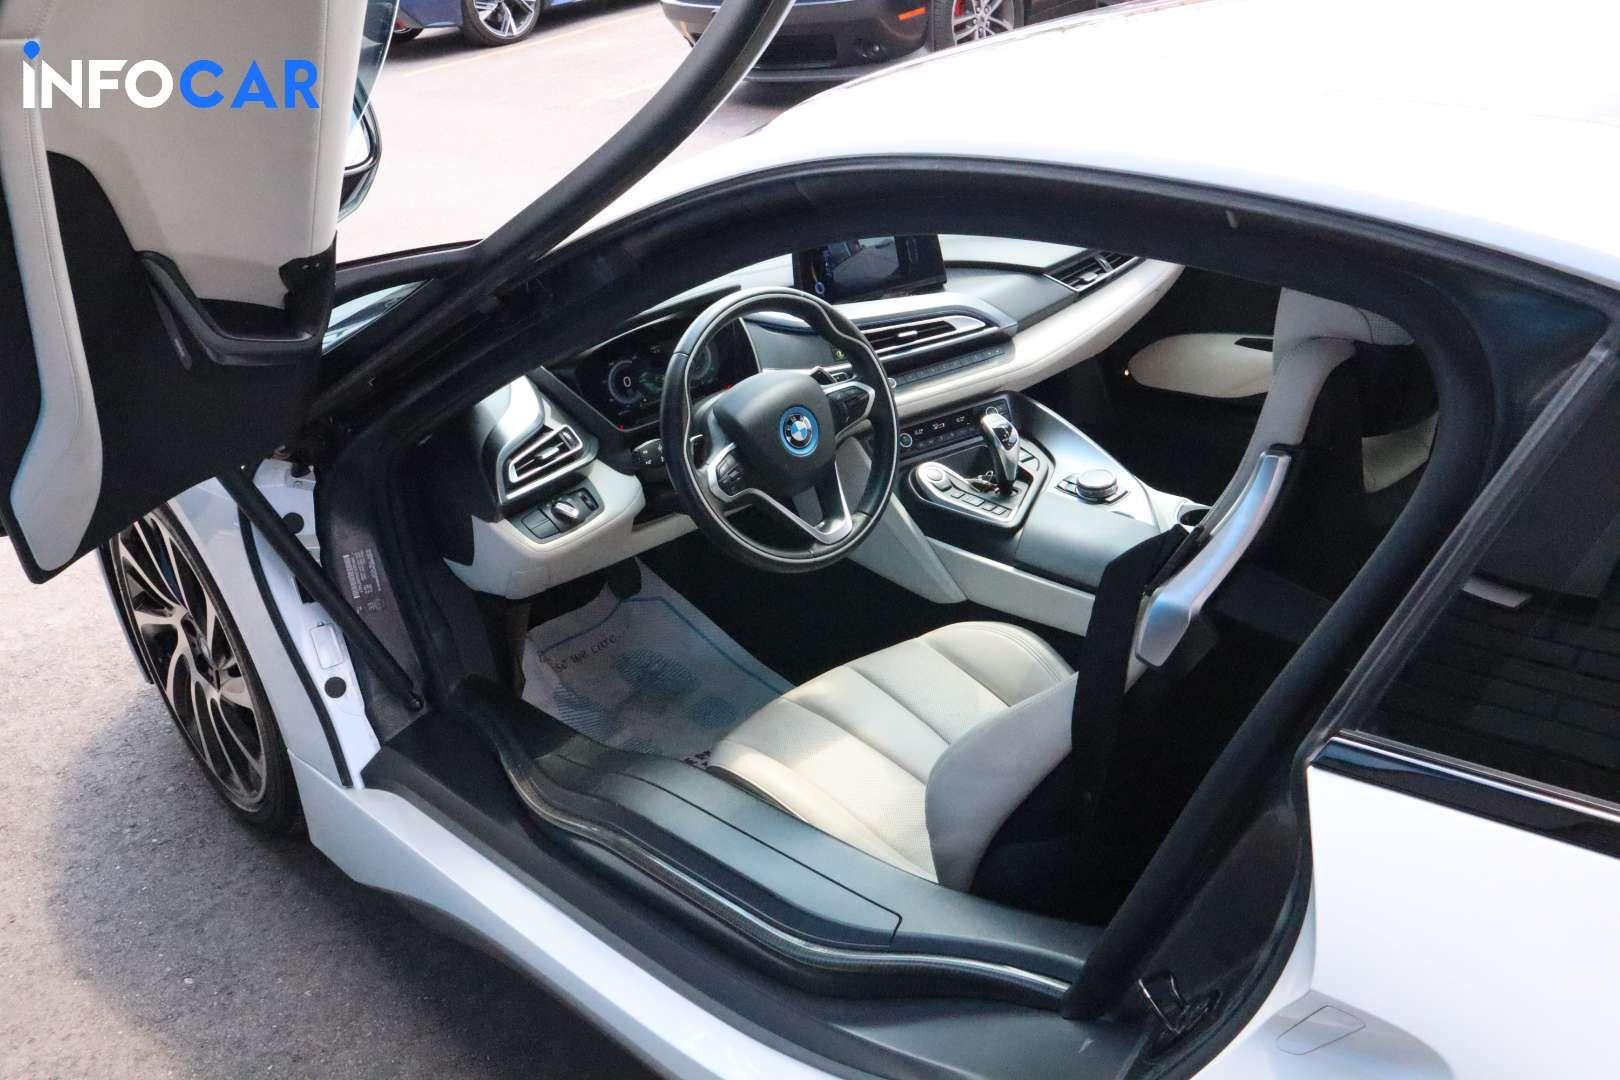 2016 BMW I8 i8 - INFOCAR - Toronto's Most Comprehensive New and Used Auto Trading Platform